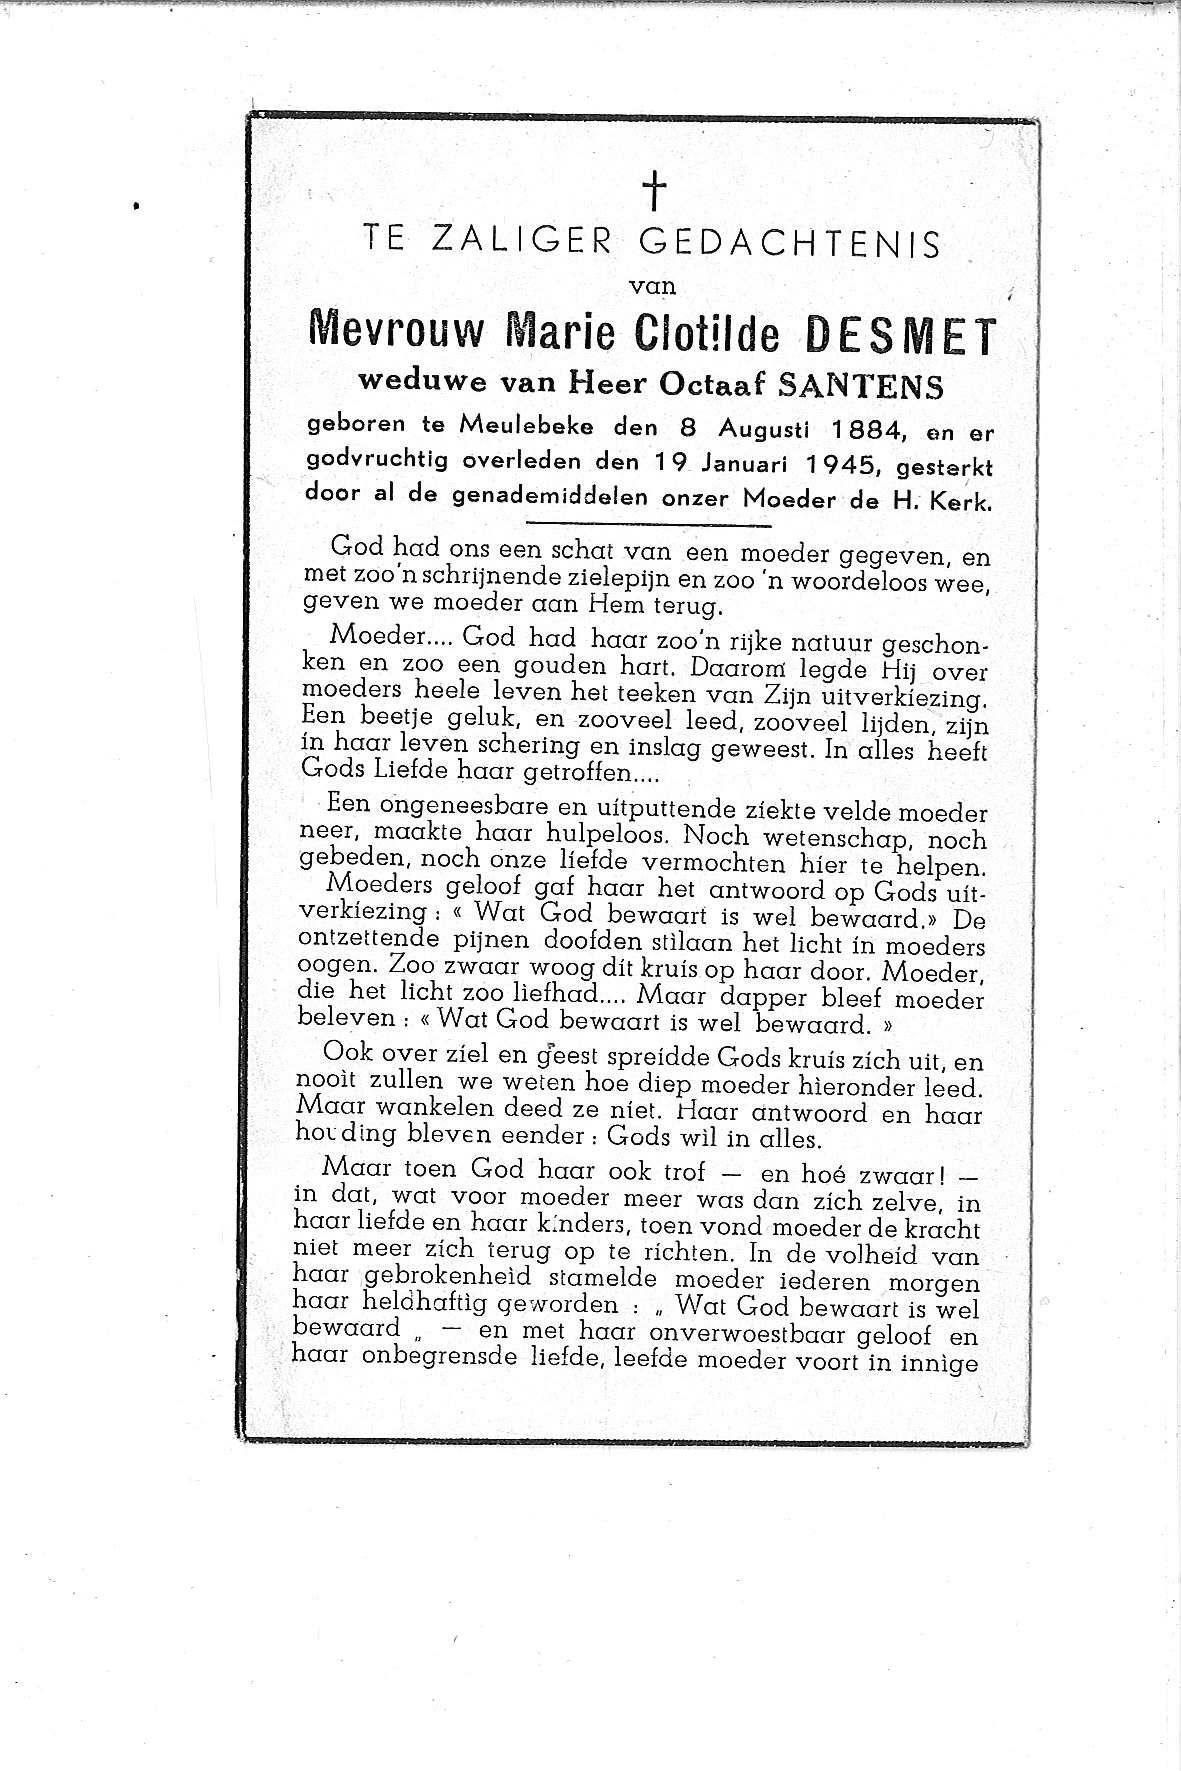 Marie Clotilde (1945) 20120424103450_00301.jpg